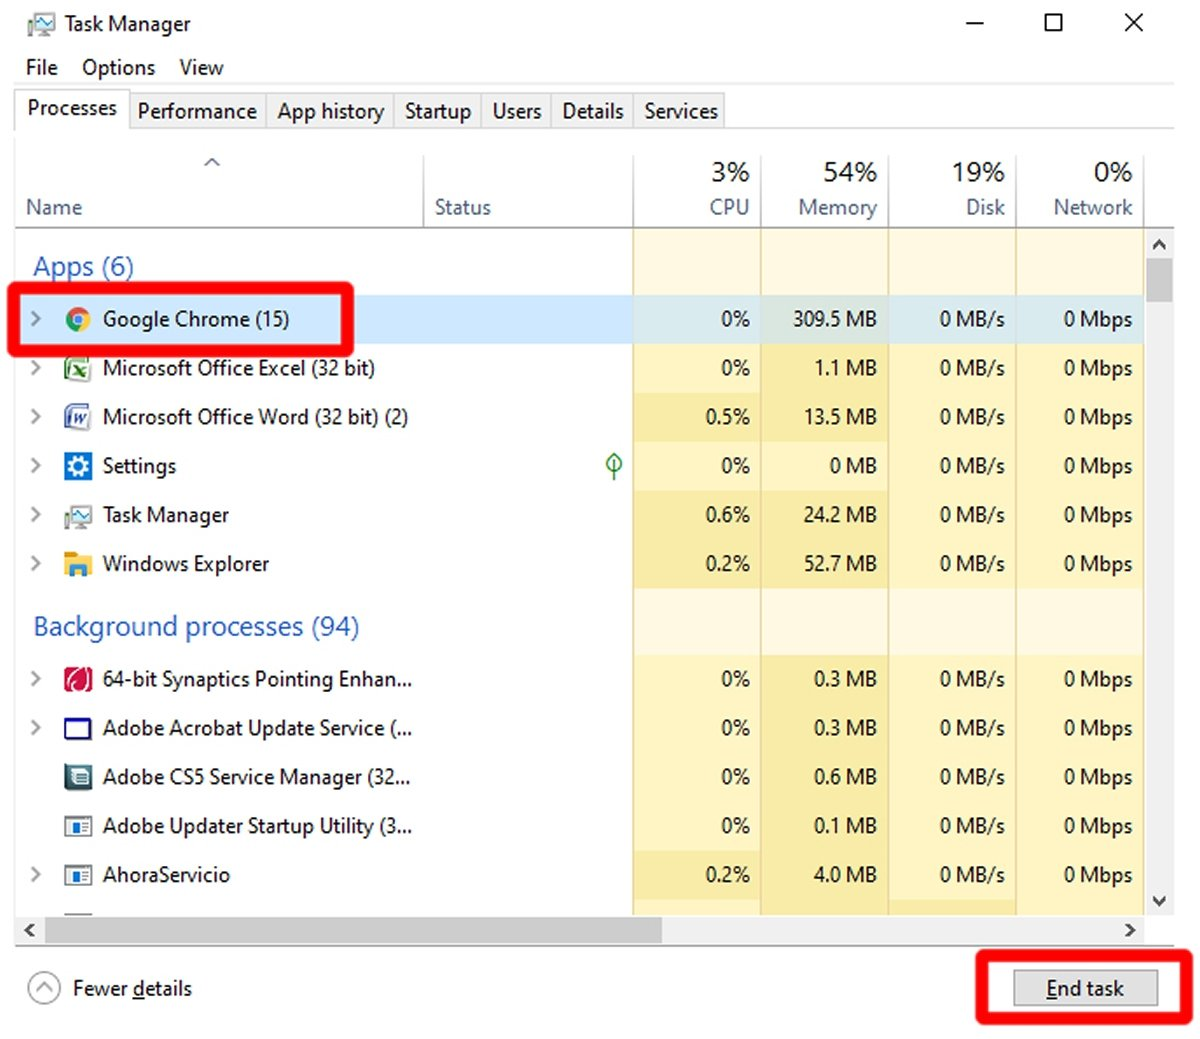 Выберите Google Chrome и нажмите Завершить задачу